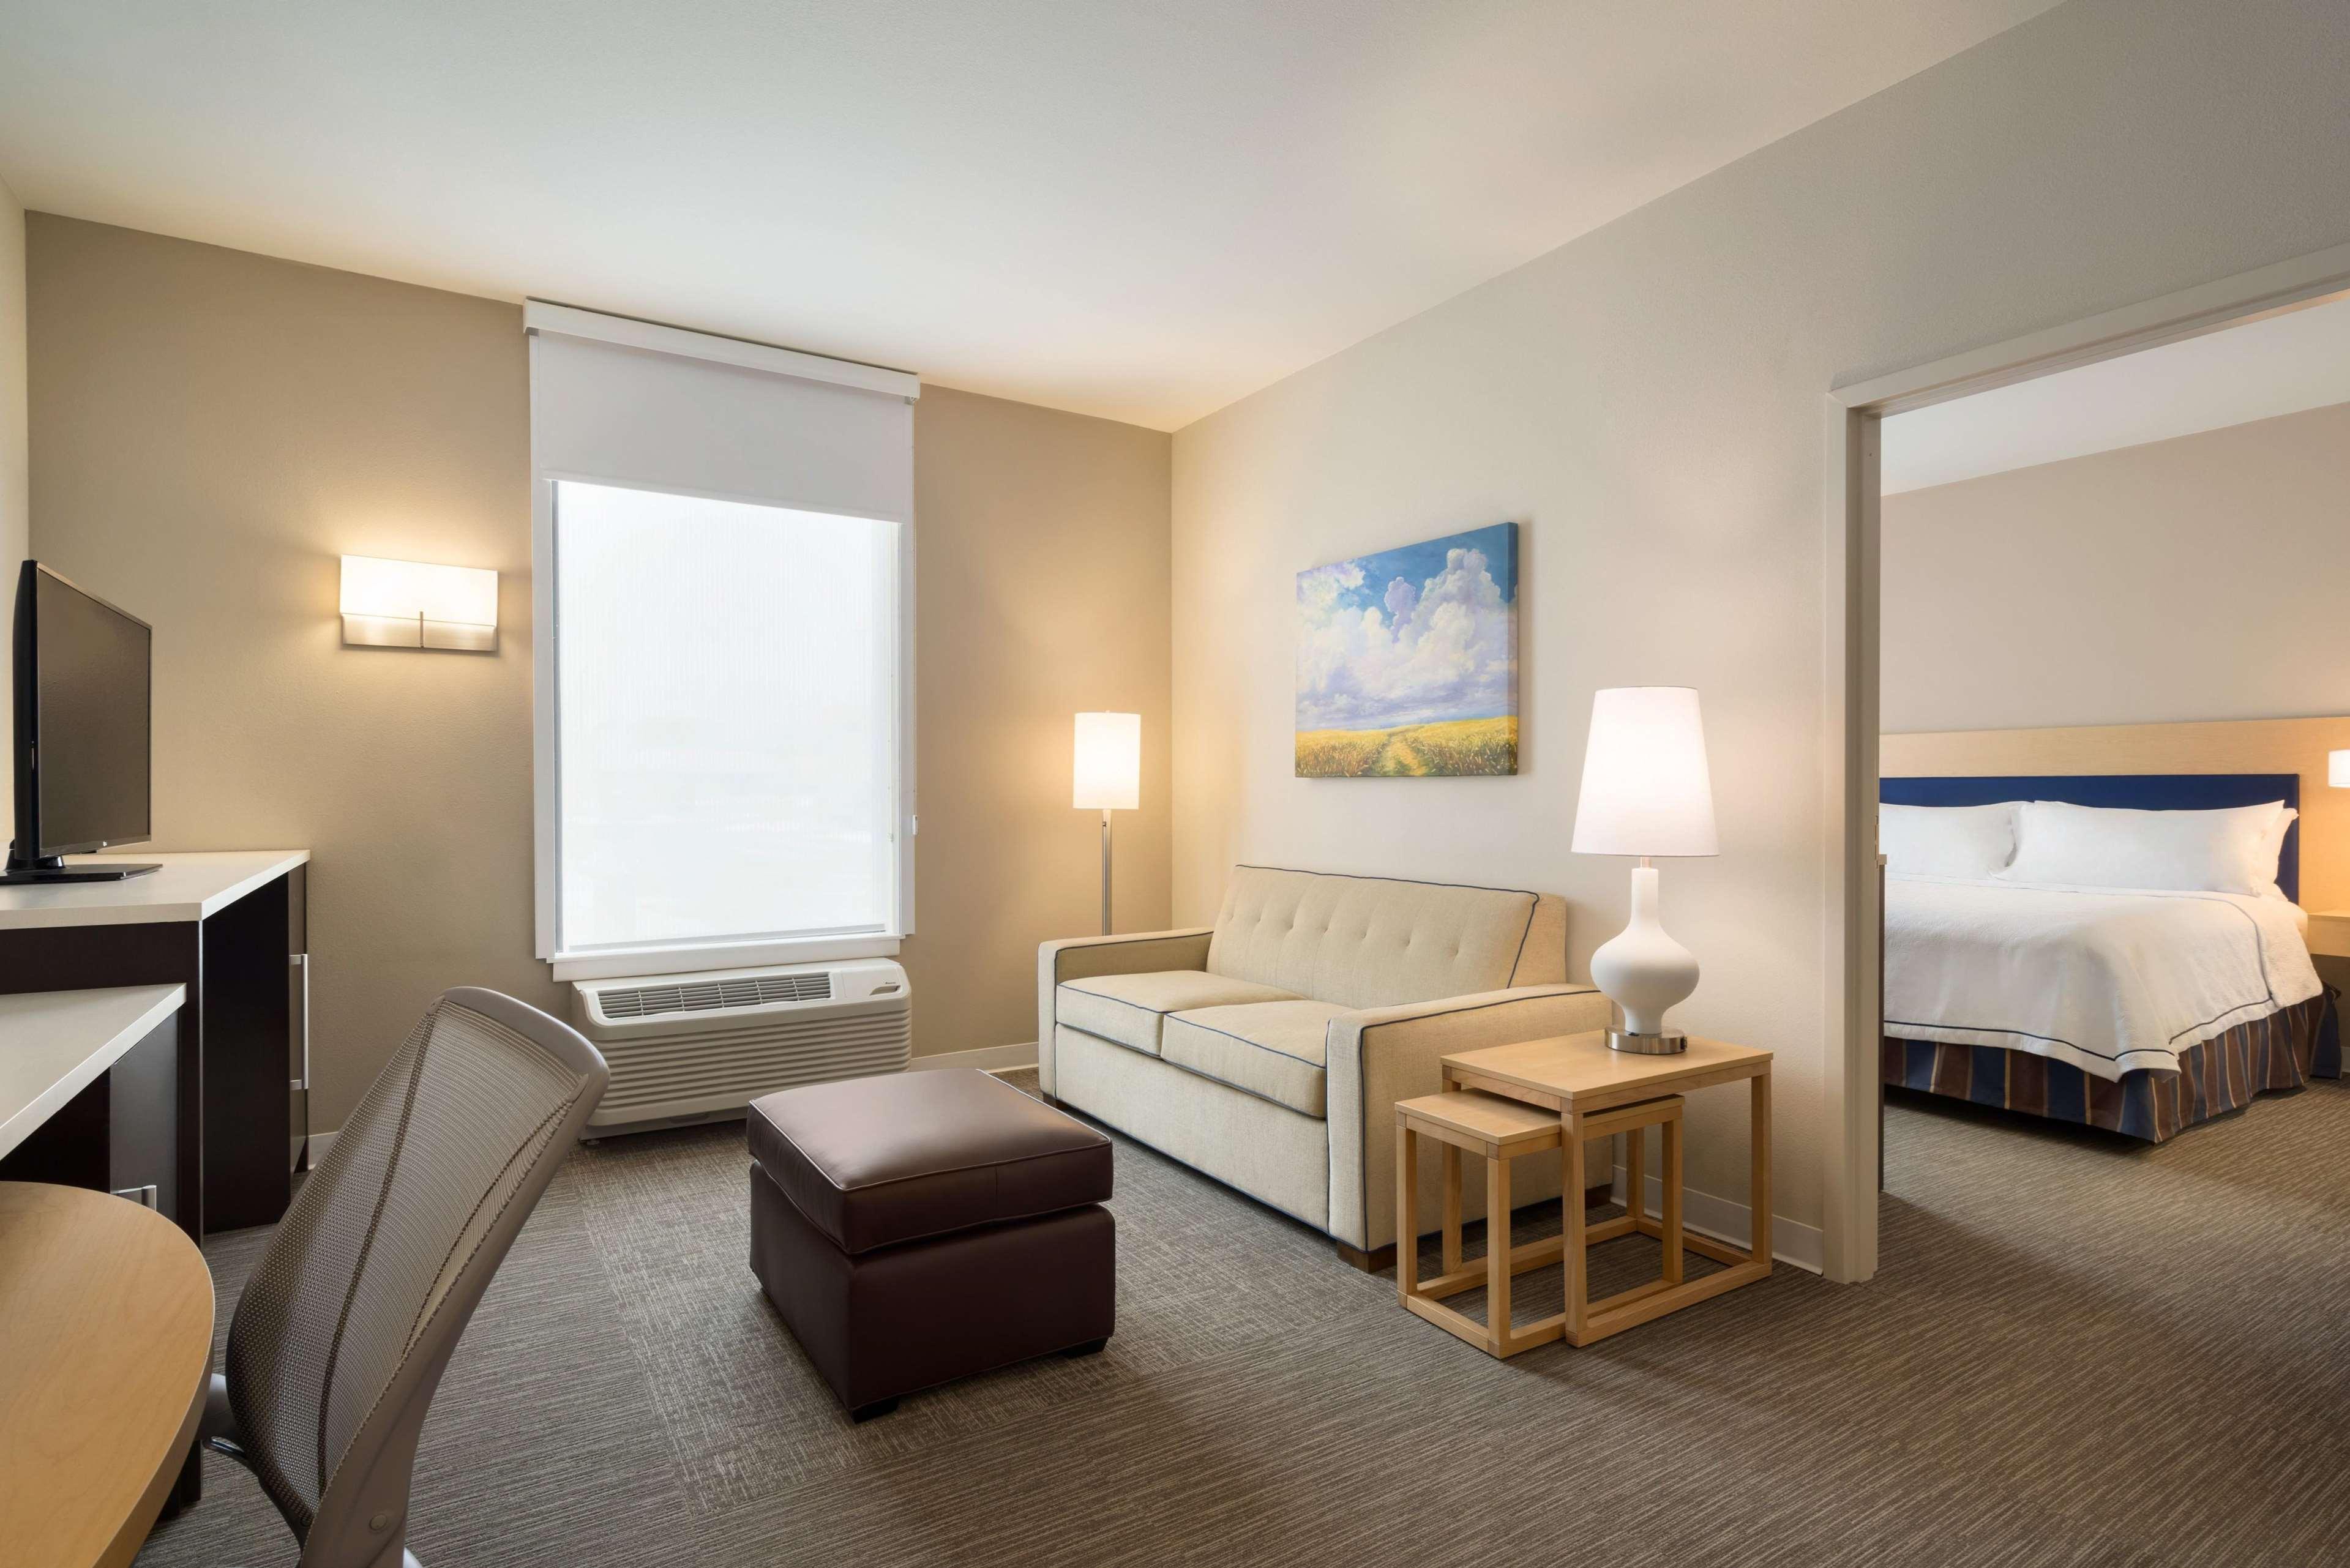 Home2 Suites by Hilton Leavenworth Downtown image 17